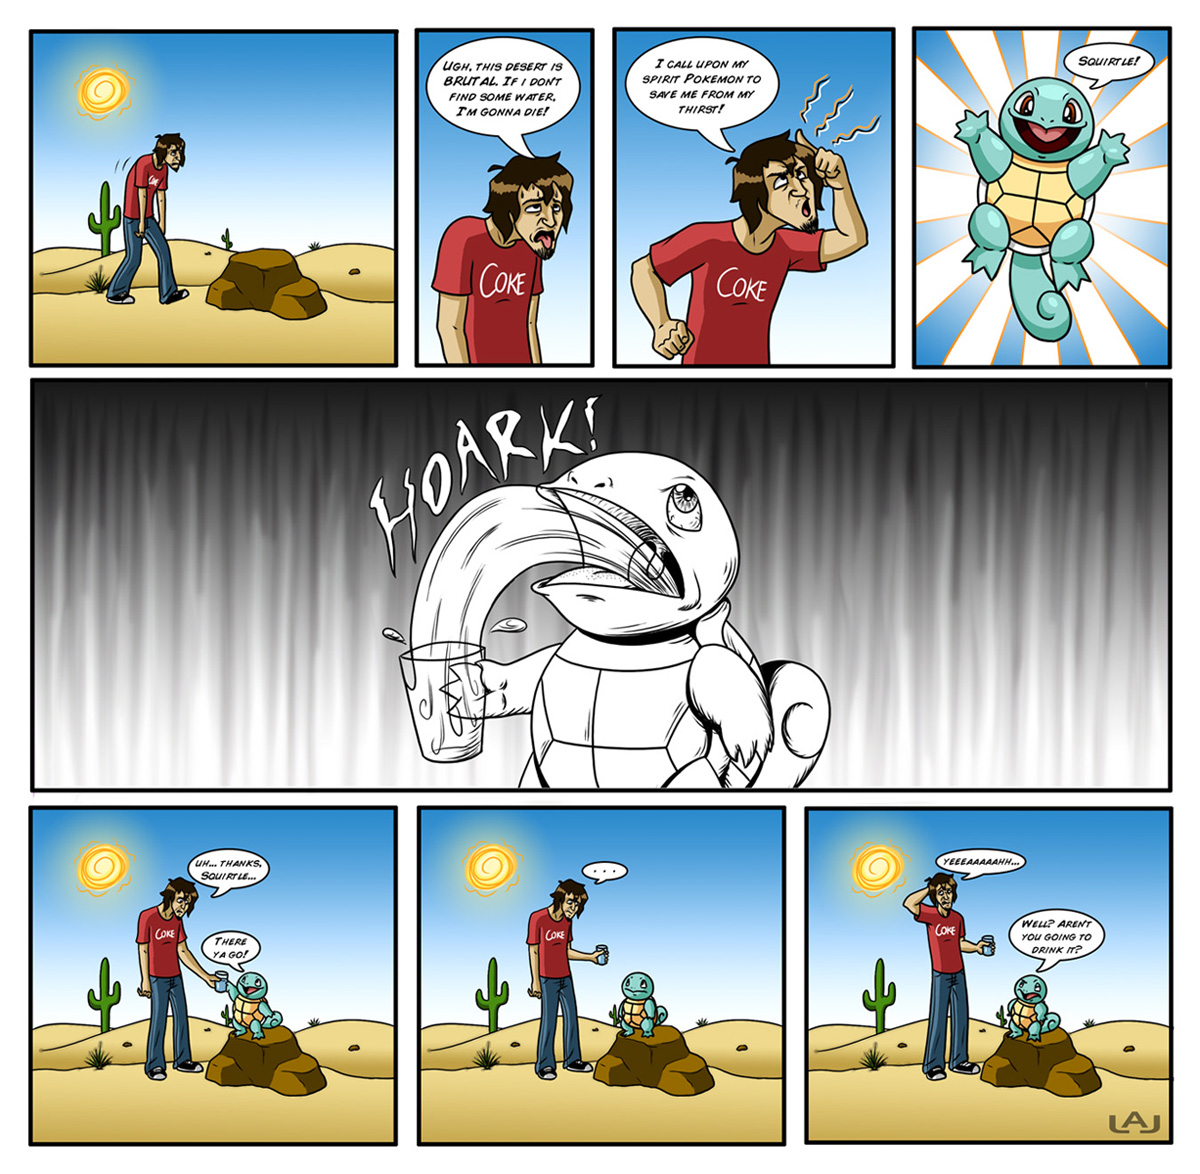 085 dj's spirit pokemon pokémon know your meme